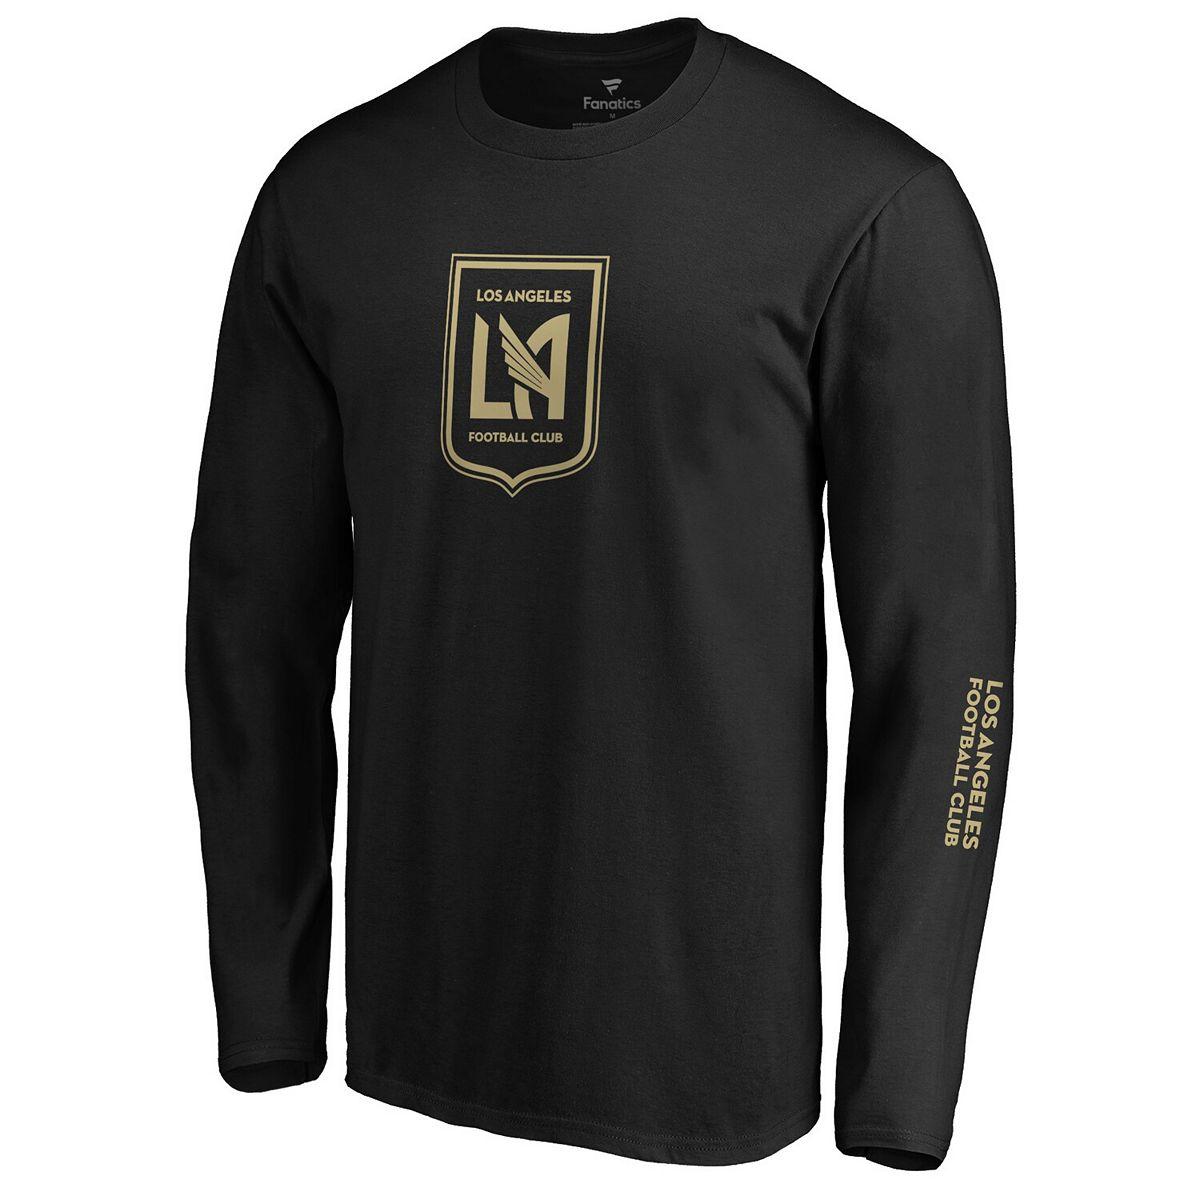 Men's Fanatics Branded Black LAFC Iconic Chase Down Long Sleeve T-Shirt UsfSL